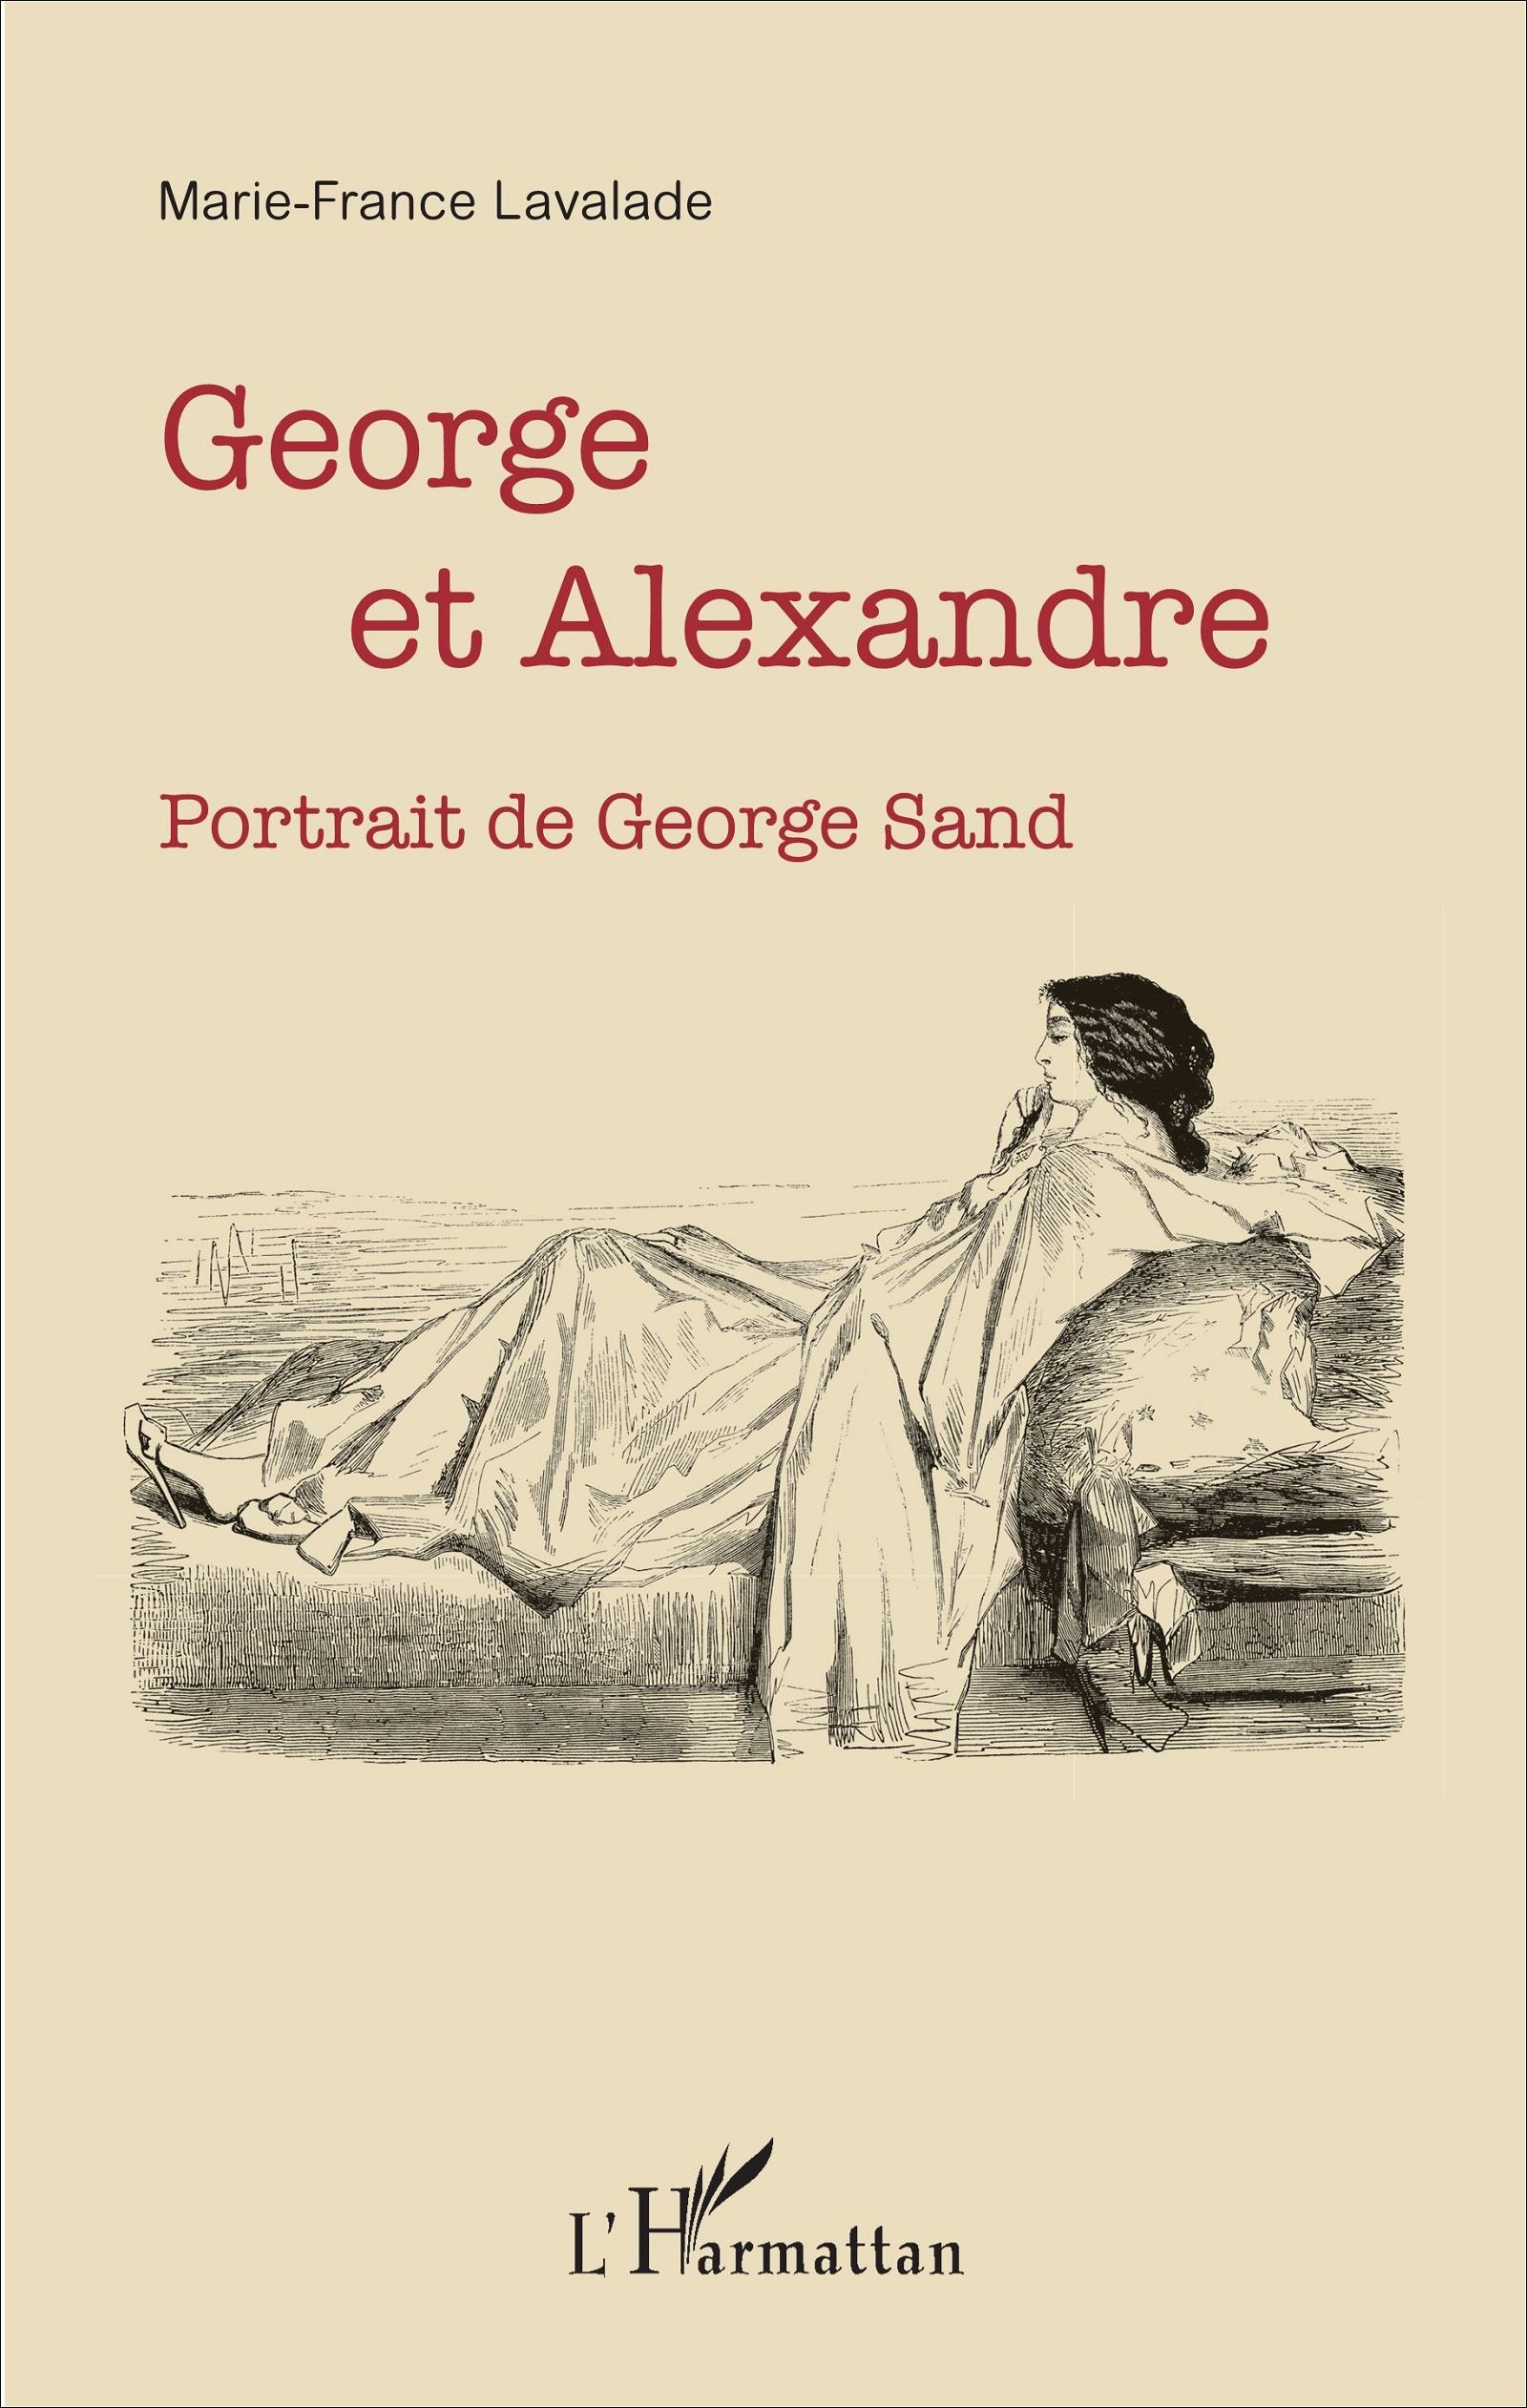 M.-F. Lavalade,GeorgeetAlexandre.Portrait de George Sand